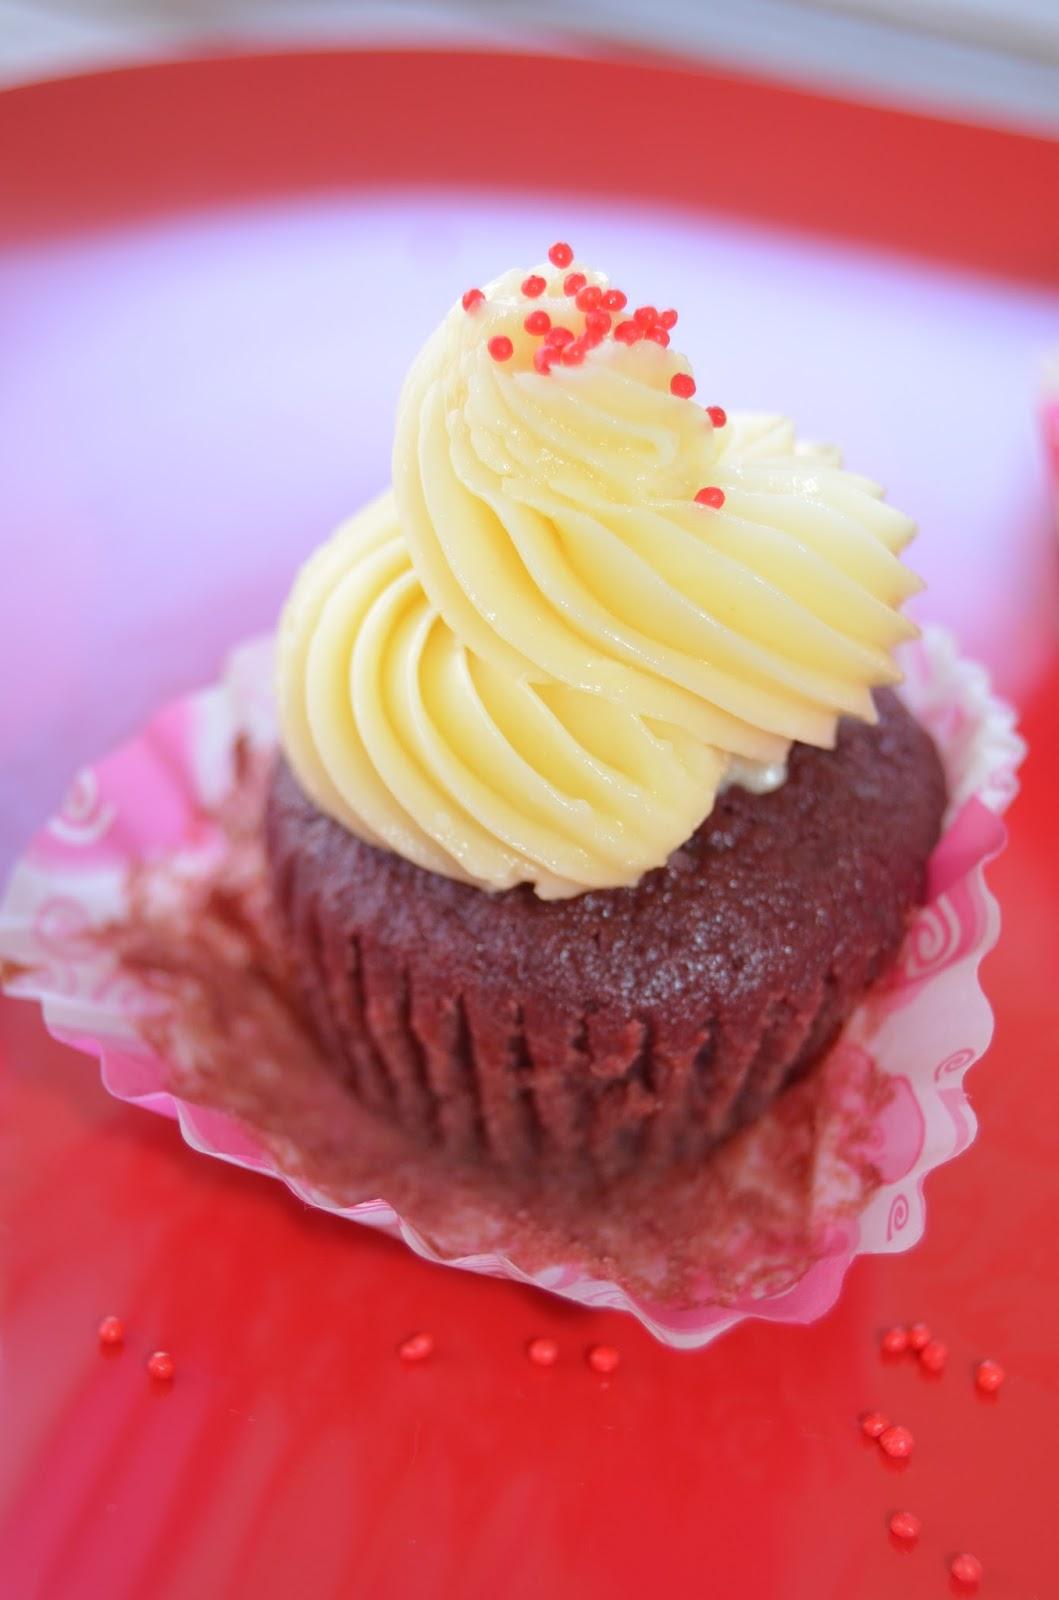 Red Velvet Cupcake con Remolacha y Queso Mascarpone